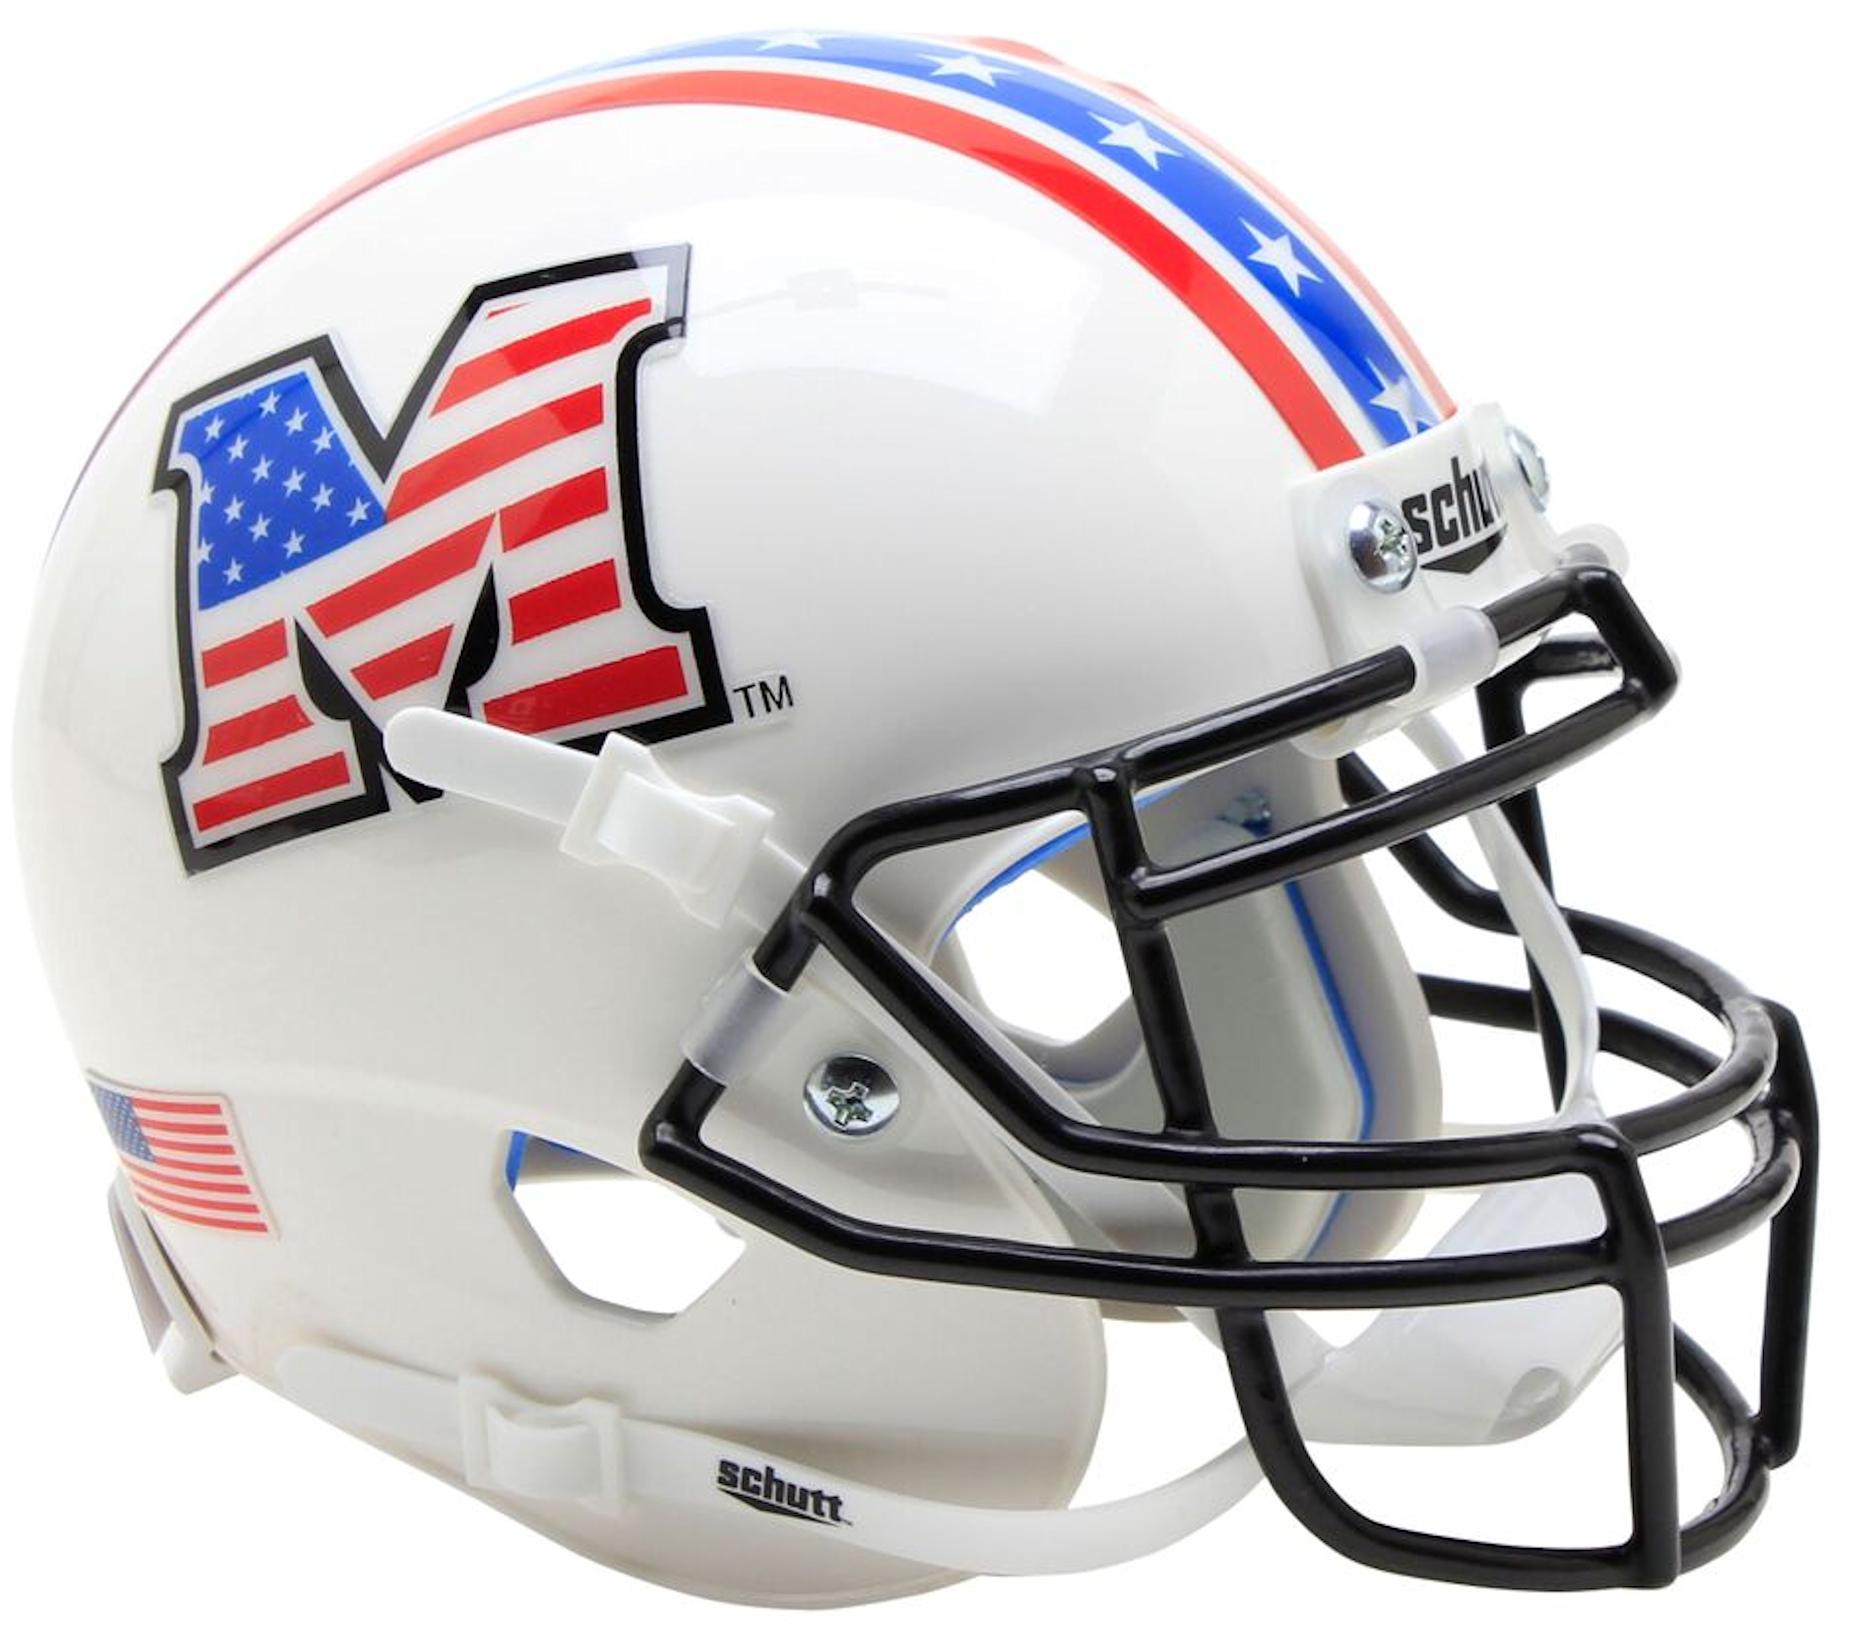 Marshall Thundering Herd Mini XP Authentic Helmet Schutt <B>Patriot</B>